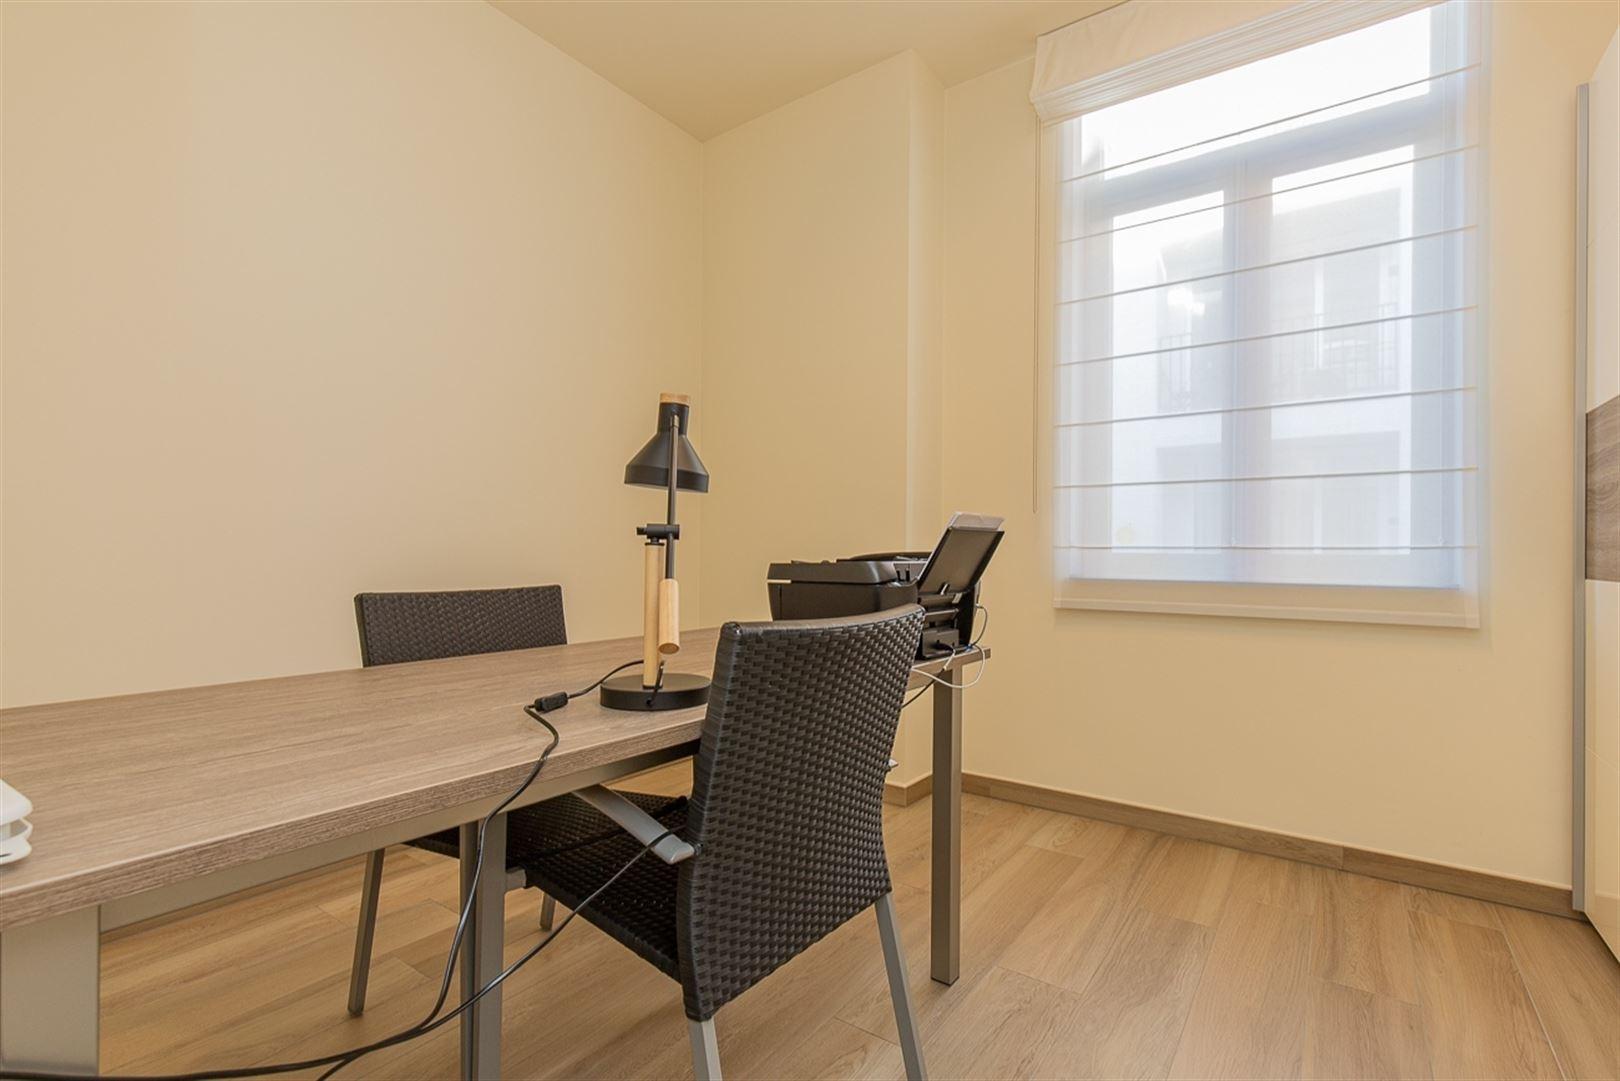 Foto 12 : Appartement te 9200 DENDERMONDE (België) - Prijs € 299.000